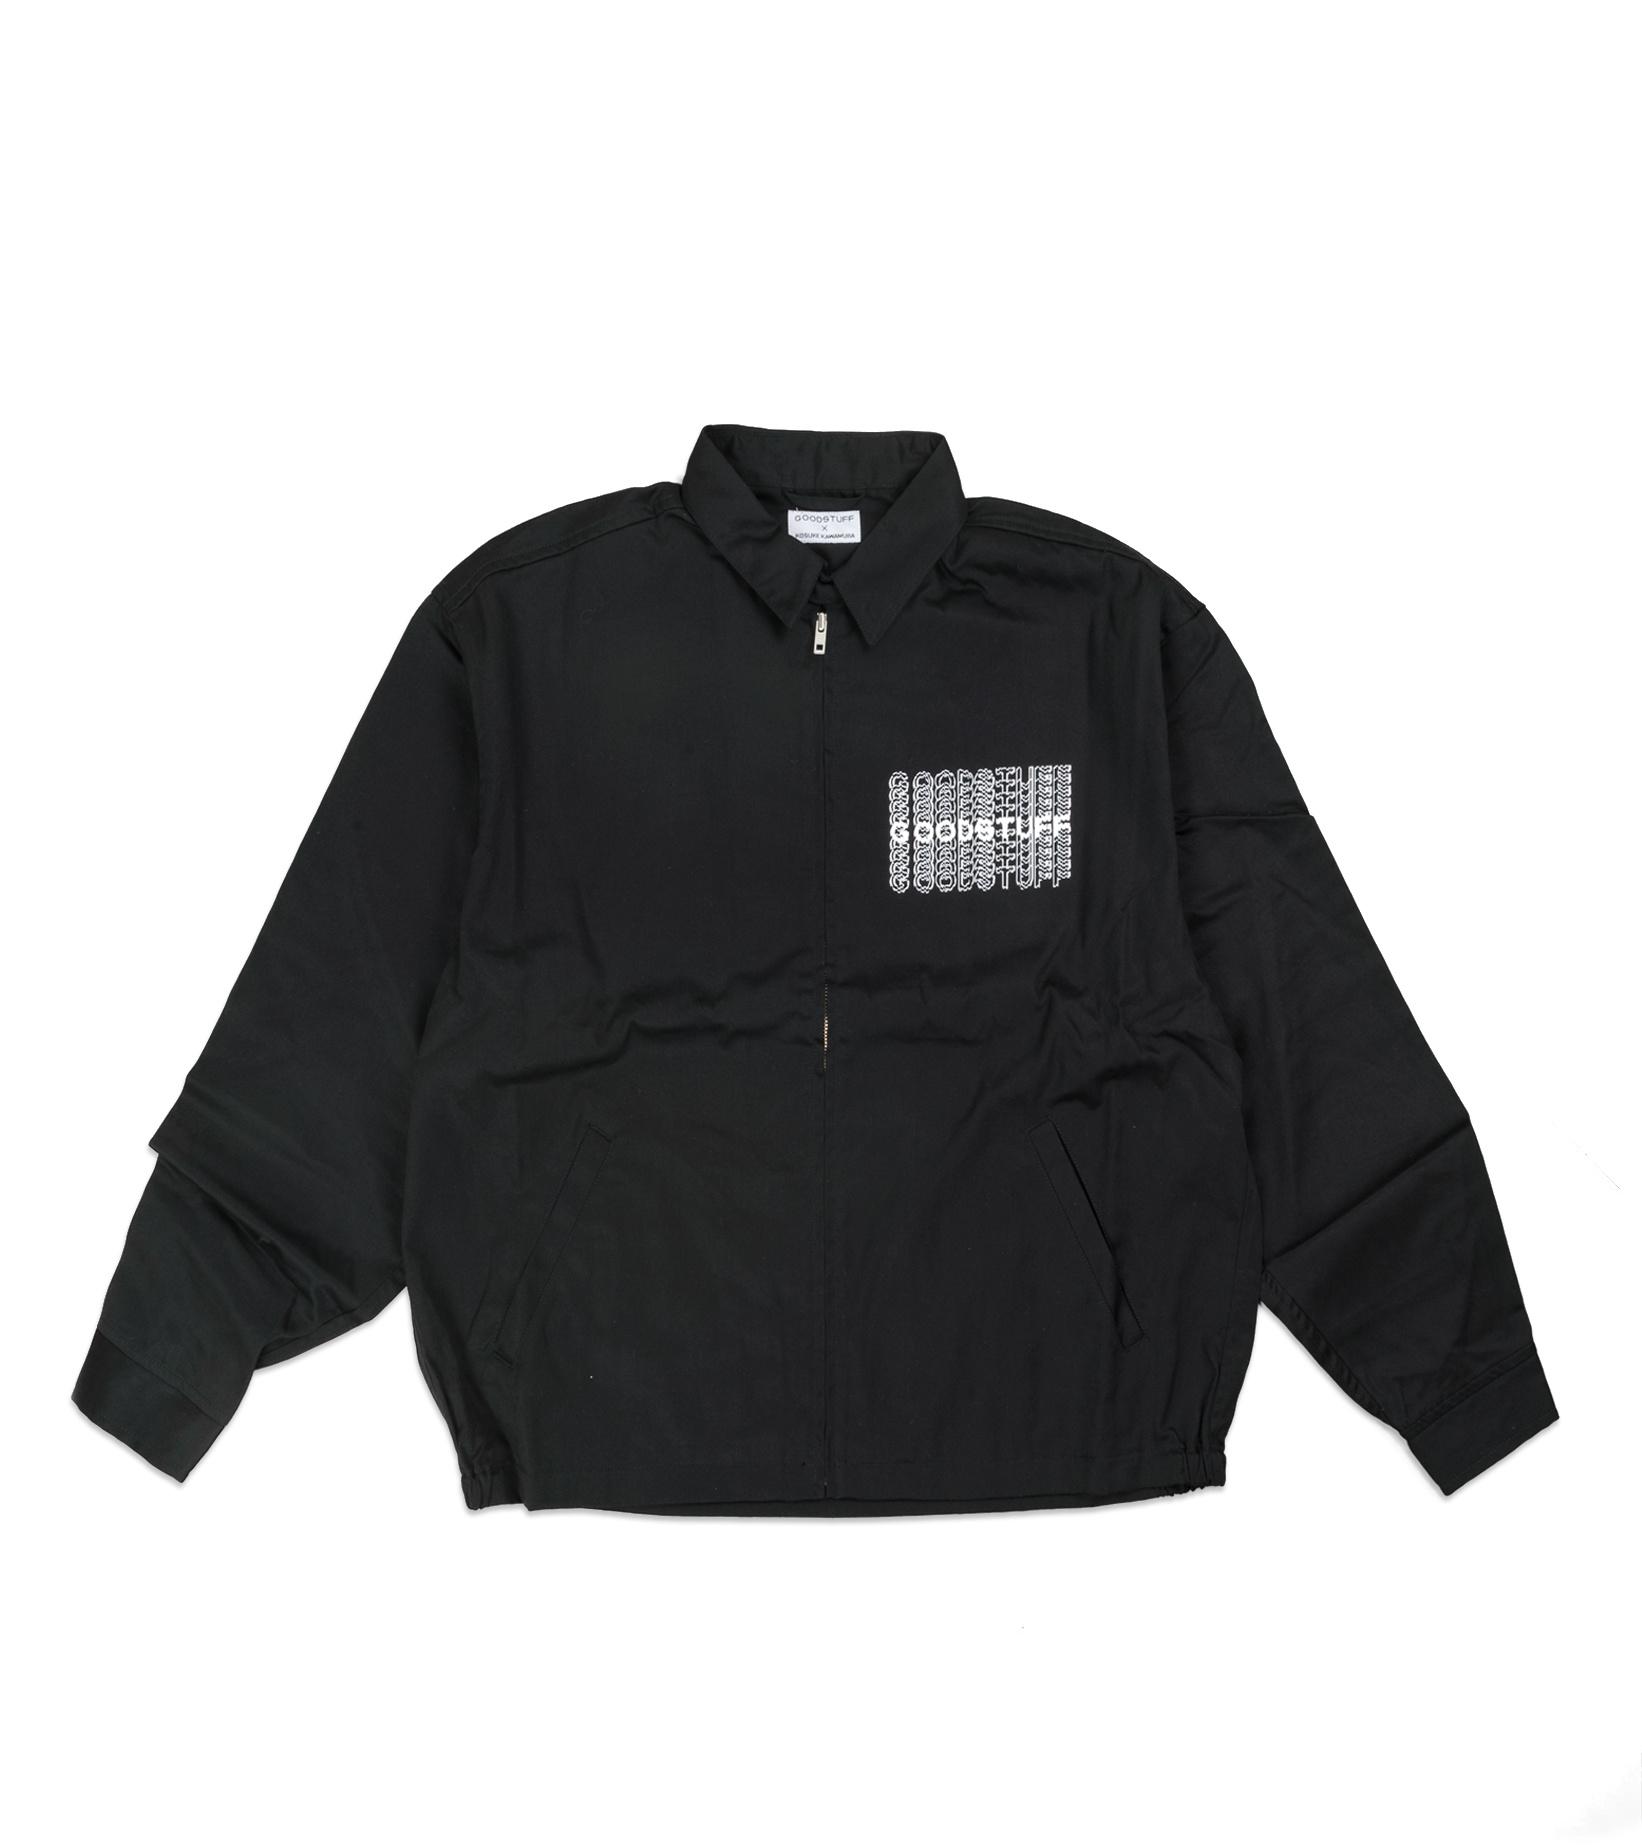 "Goodhood x Kosuke Kawamura Swing Top Jacket ""Black""-1"